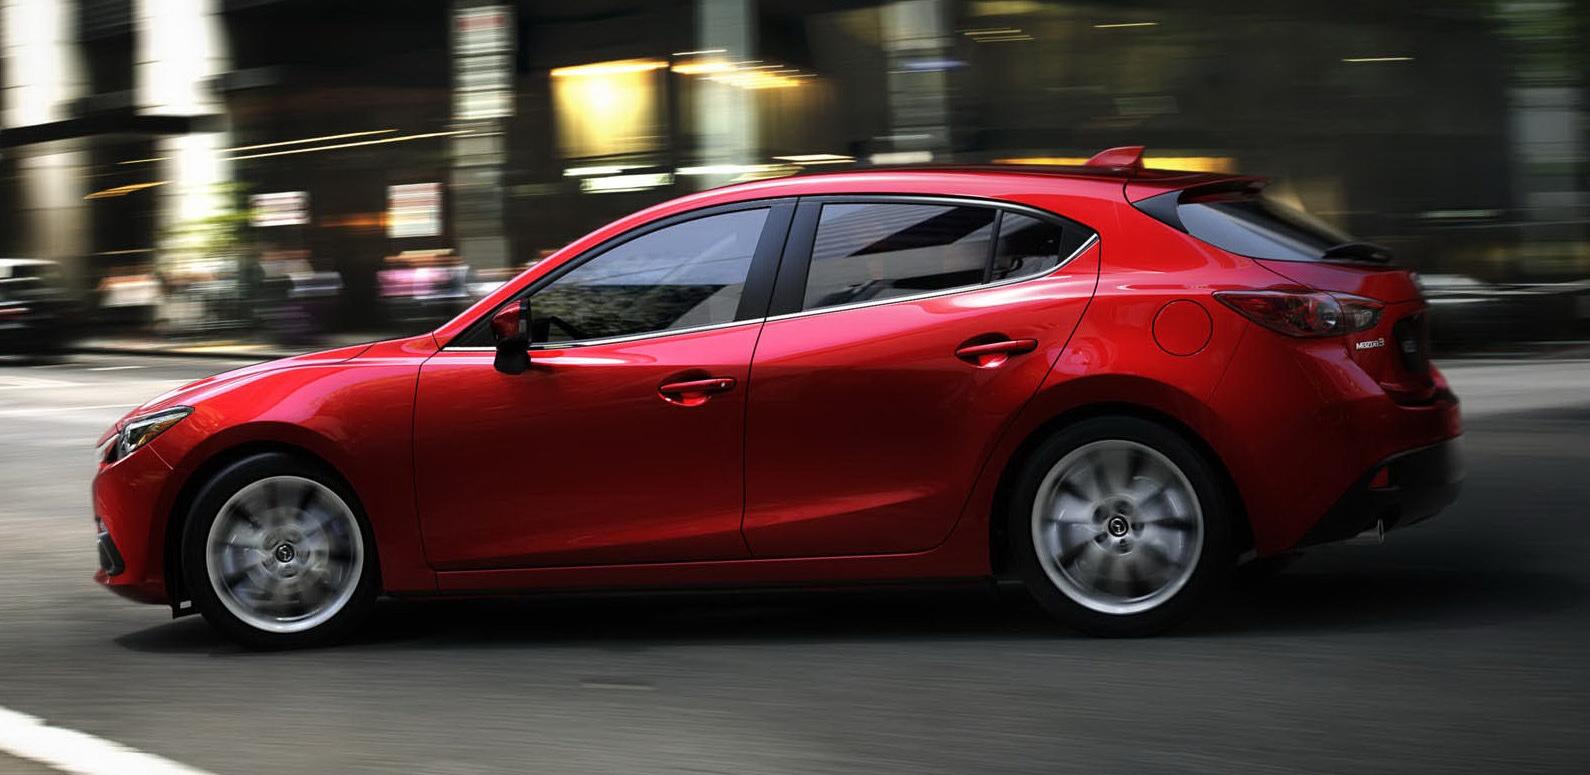 ASIAN AUTO DIGEST: 2014 Mazda 3 Hatchback Official World Debut